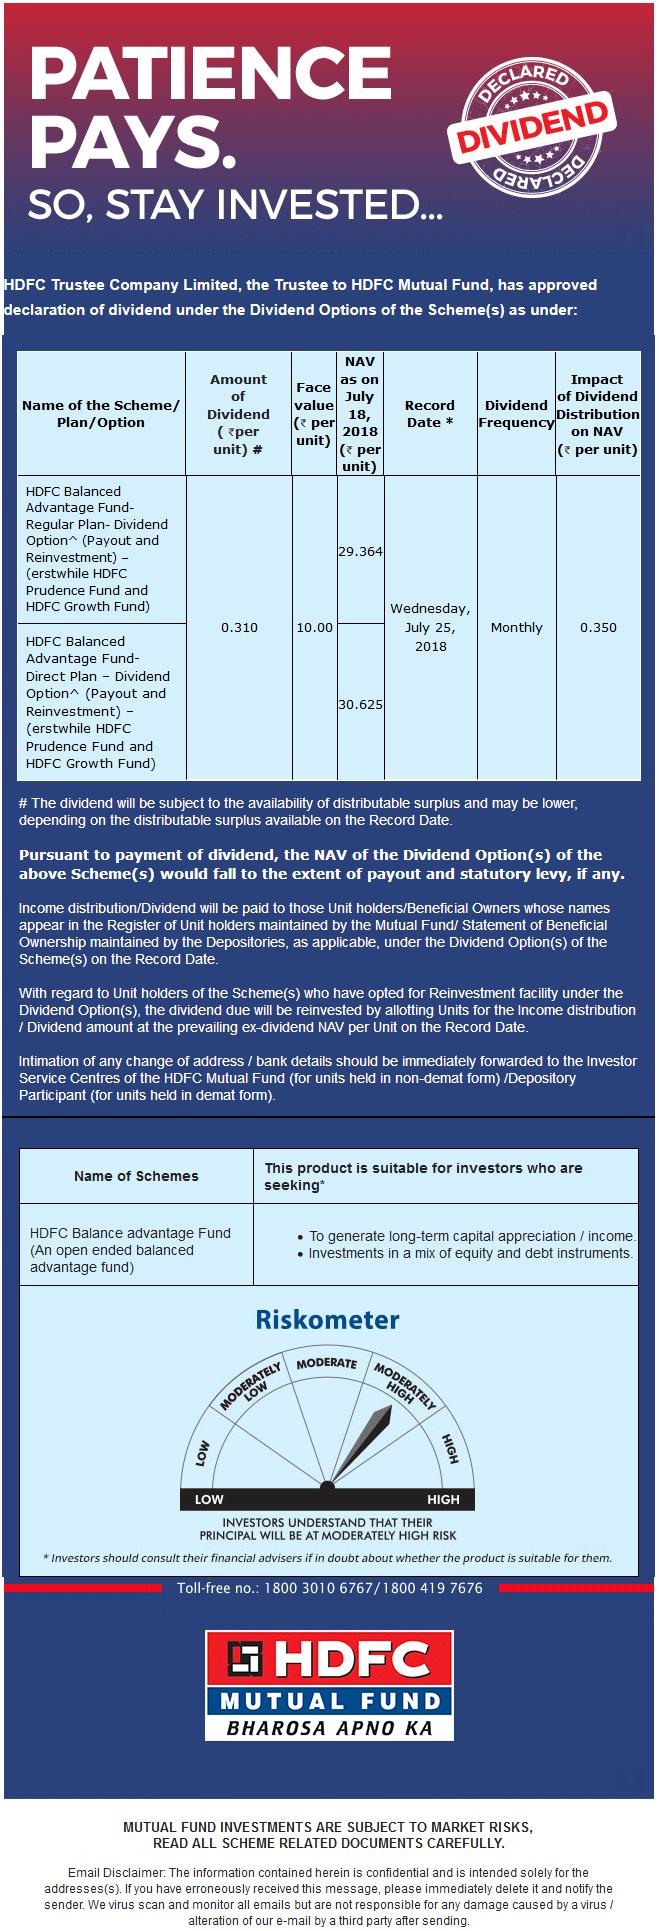 hdfc balanced advantage fund dividend